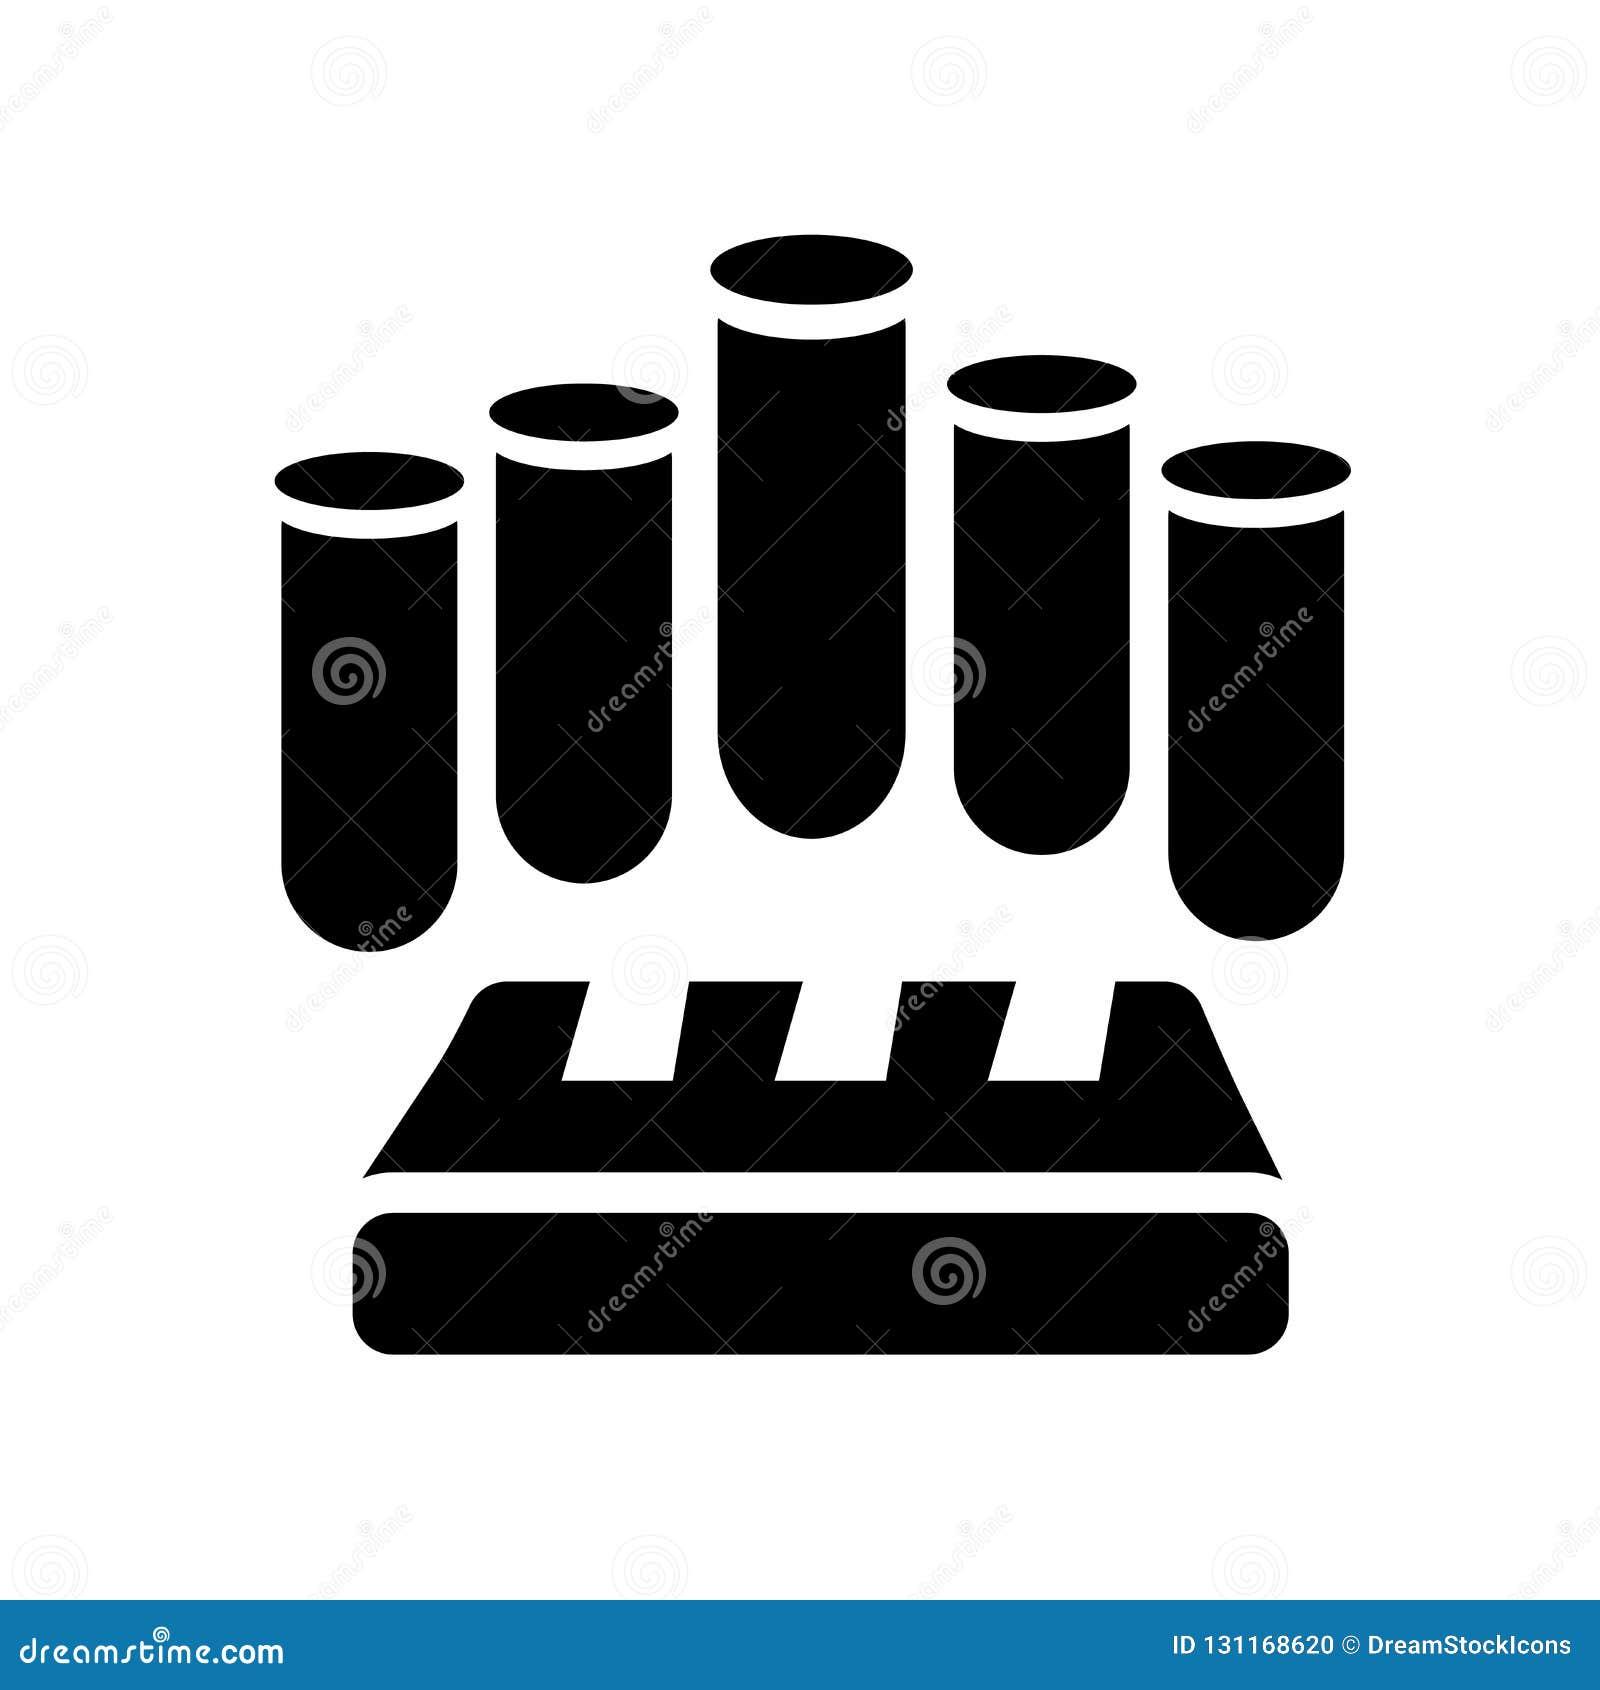 Organsymbol